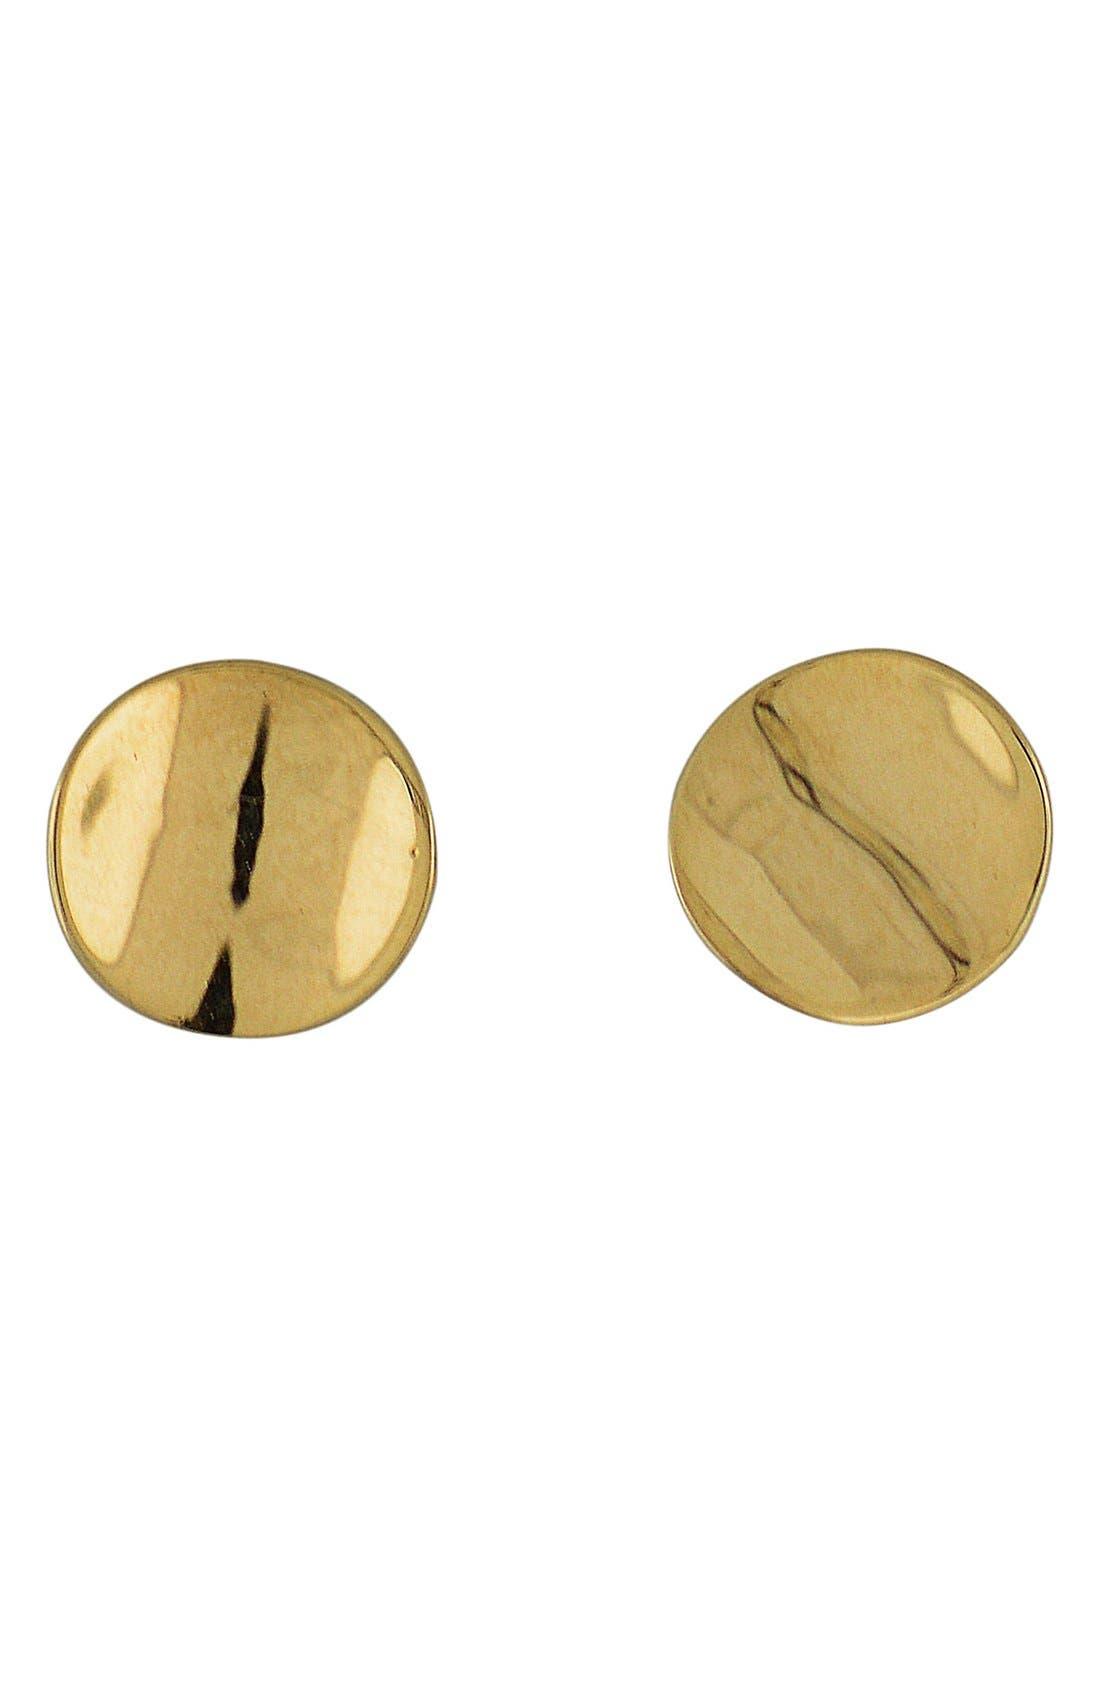 Bony Levey Aurelia Stud Earrings,                         Main,                         color, YELLOW GOLD